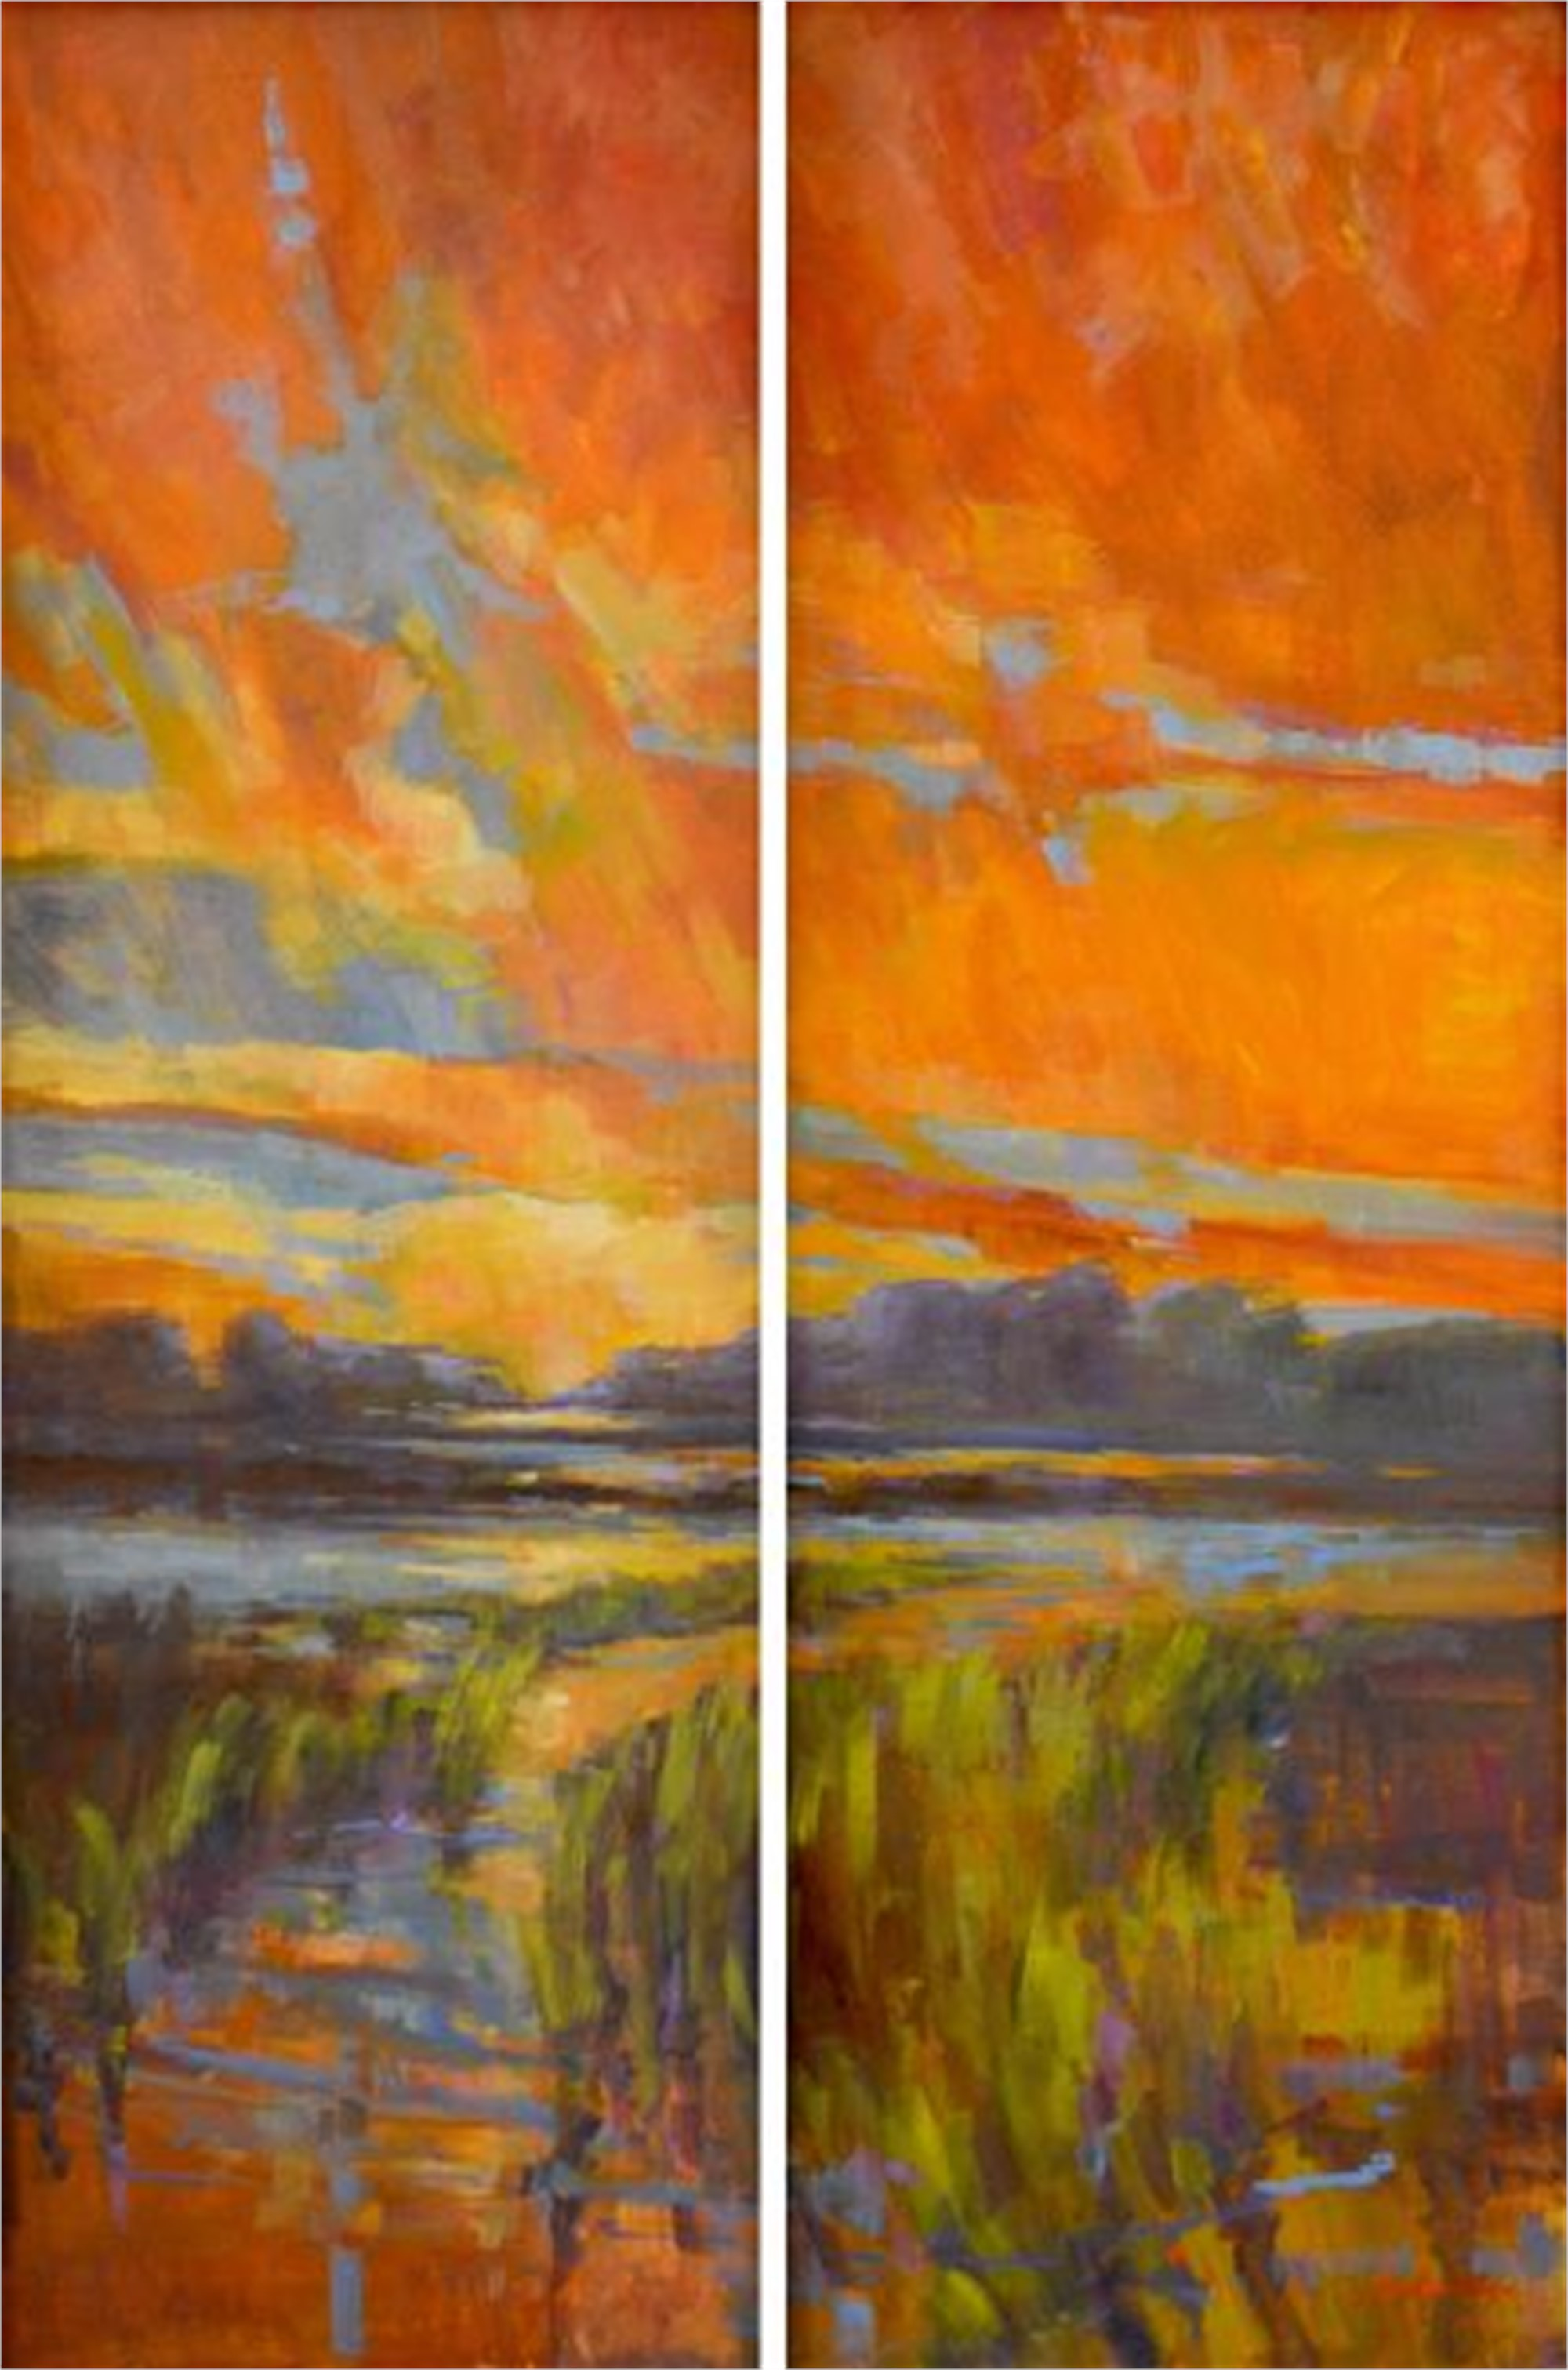 Lowcountry Wonder (Diptych) by Karen Hewitt Hagan